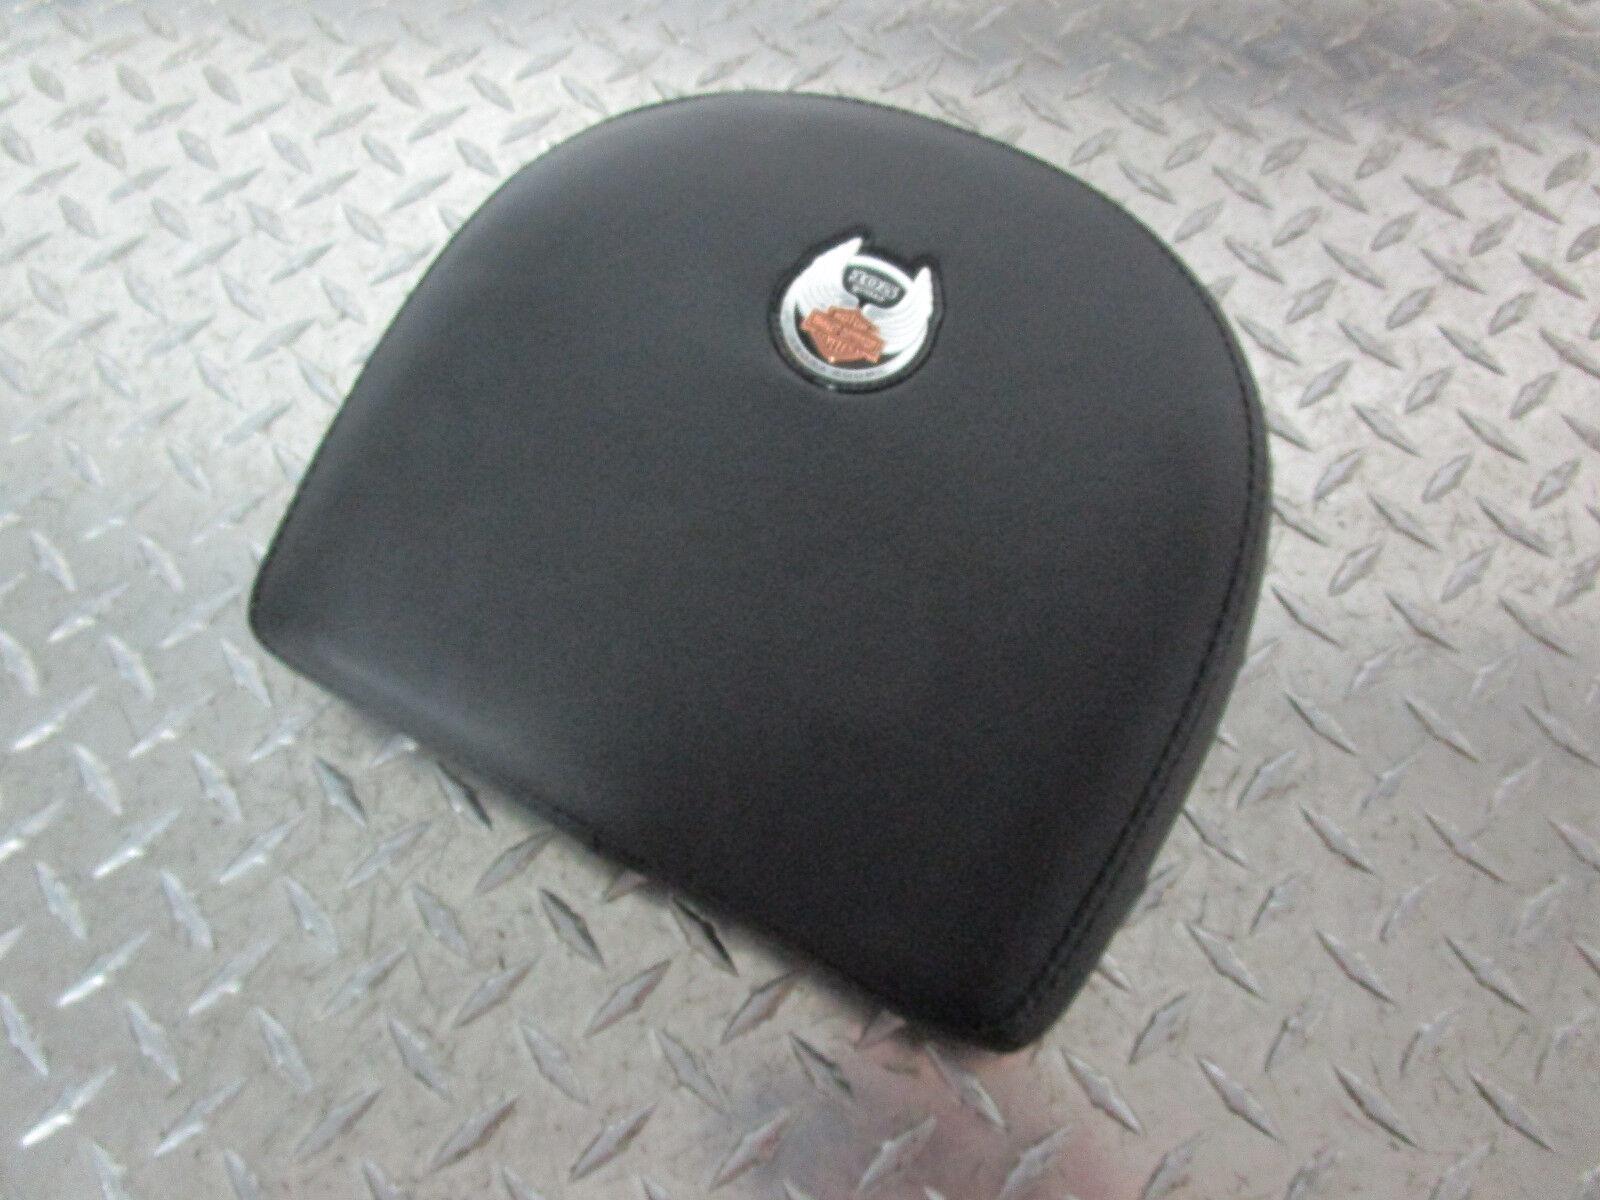 2008 Harley Davidson Flstn Softail Deluxe 105th Anniversary Backrest Pad Ebay